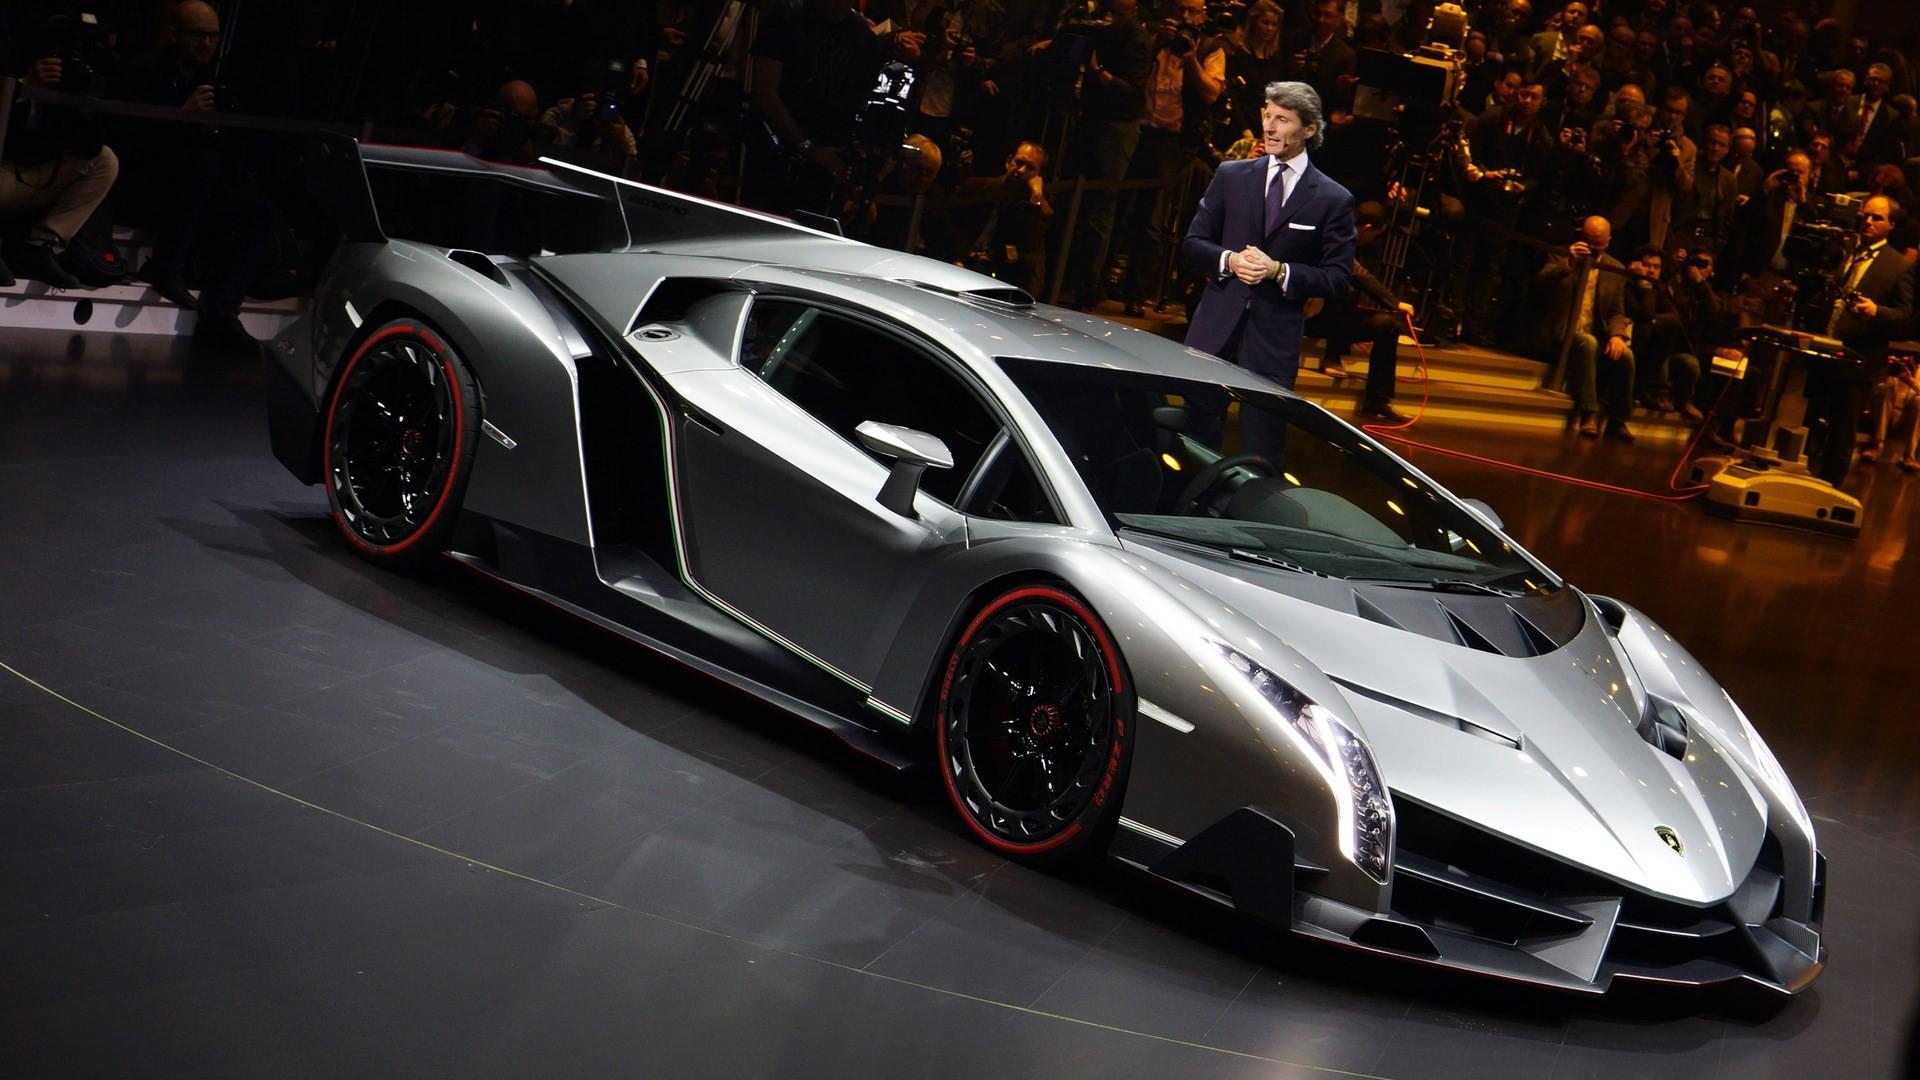 Lamborghini veneno wallpapers 64 images - Lamborghini veneno wallpaper android ...